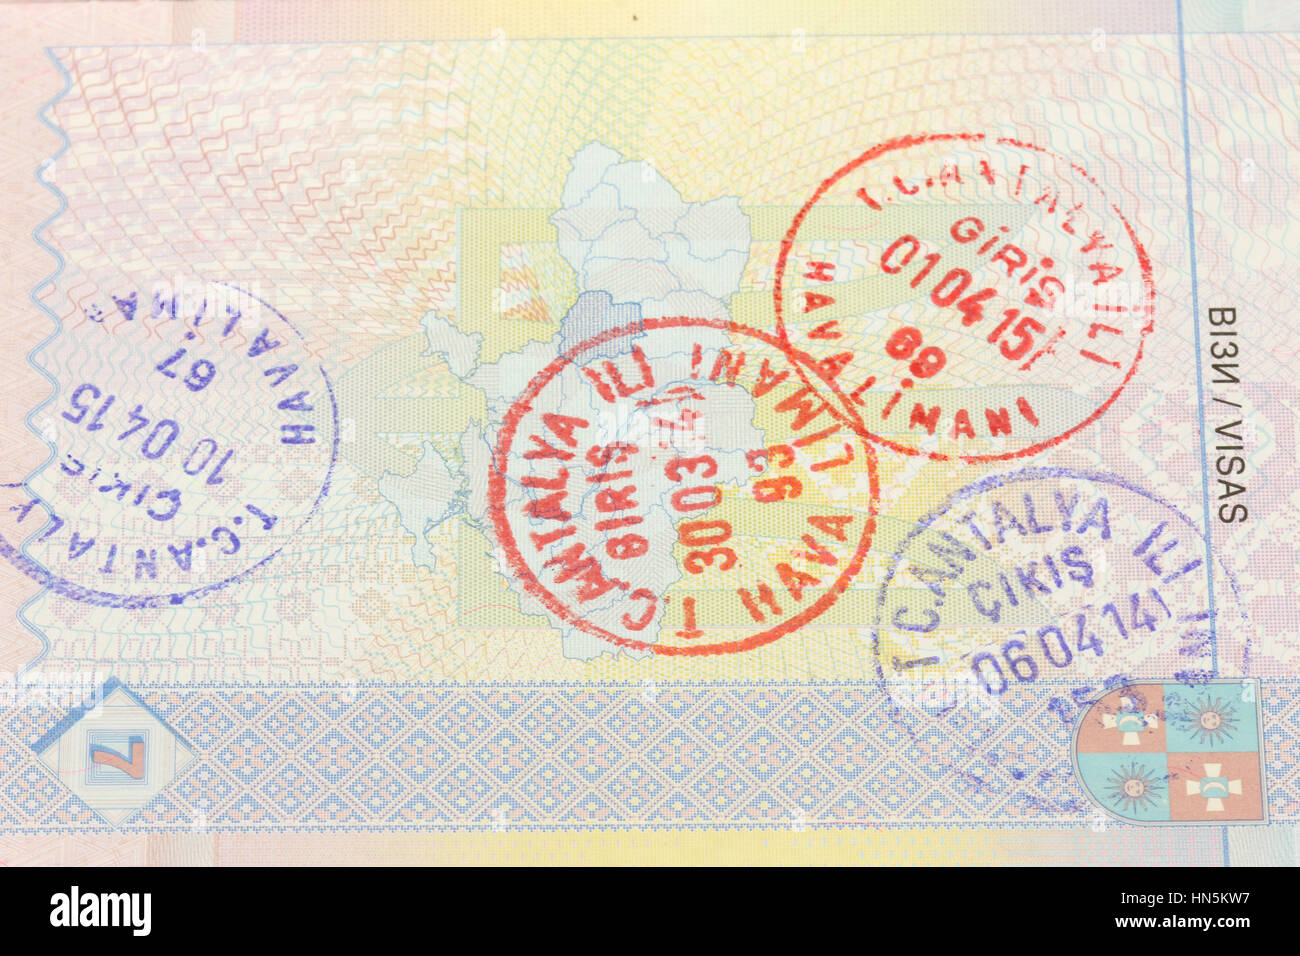 Entry visa stamp in Turkey in Antalya Stock Photo